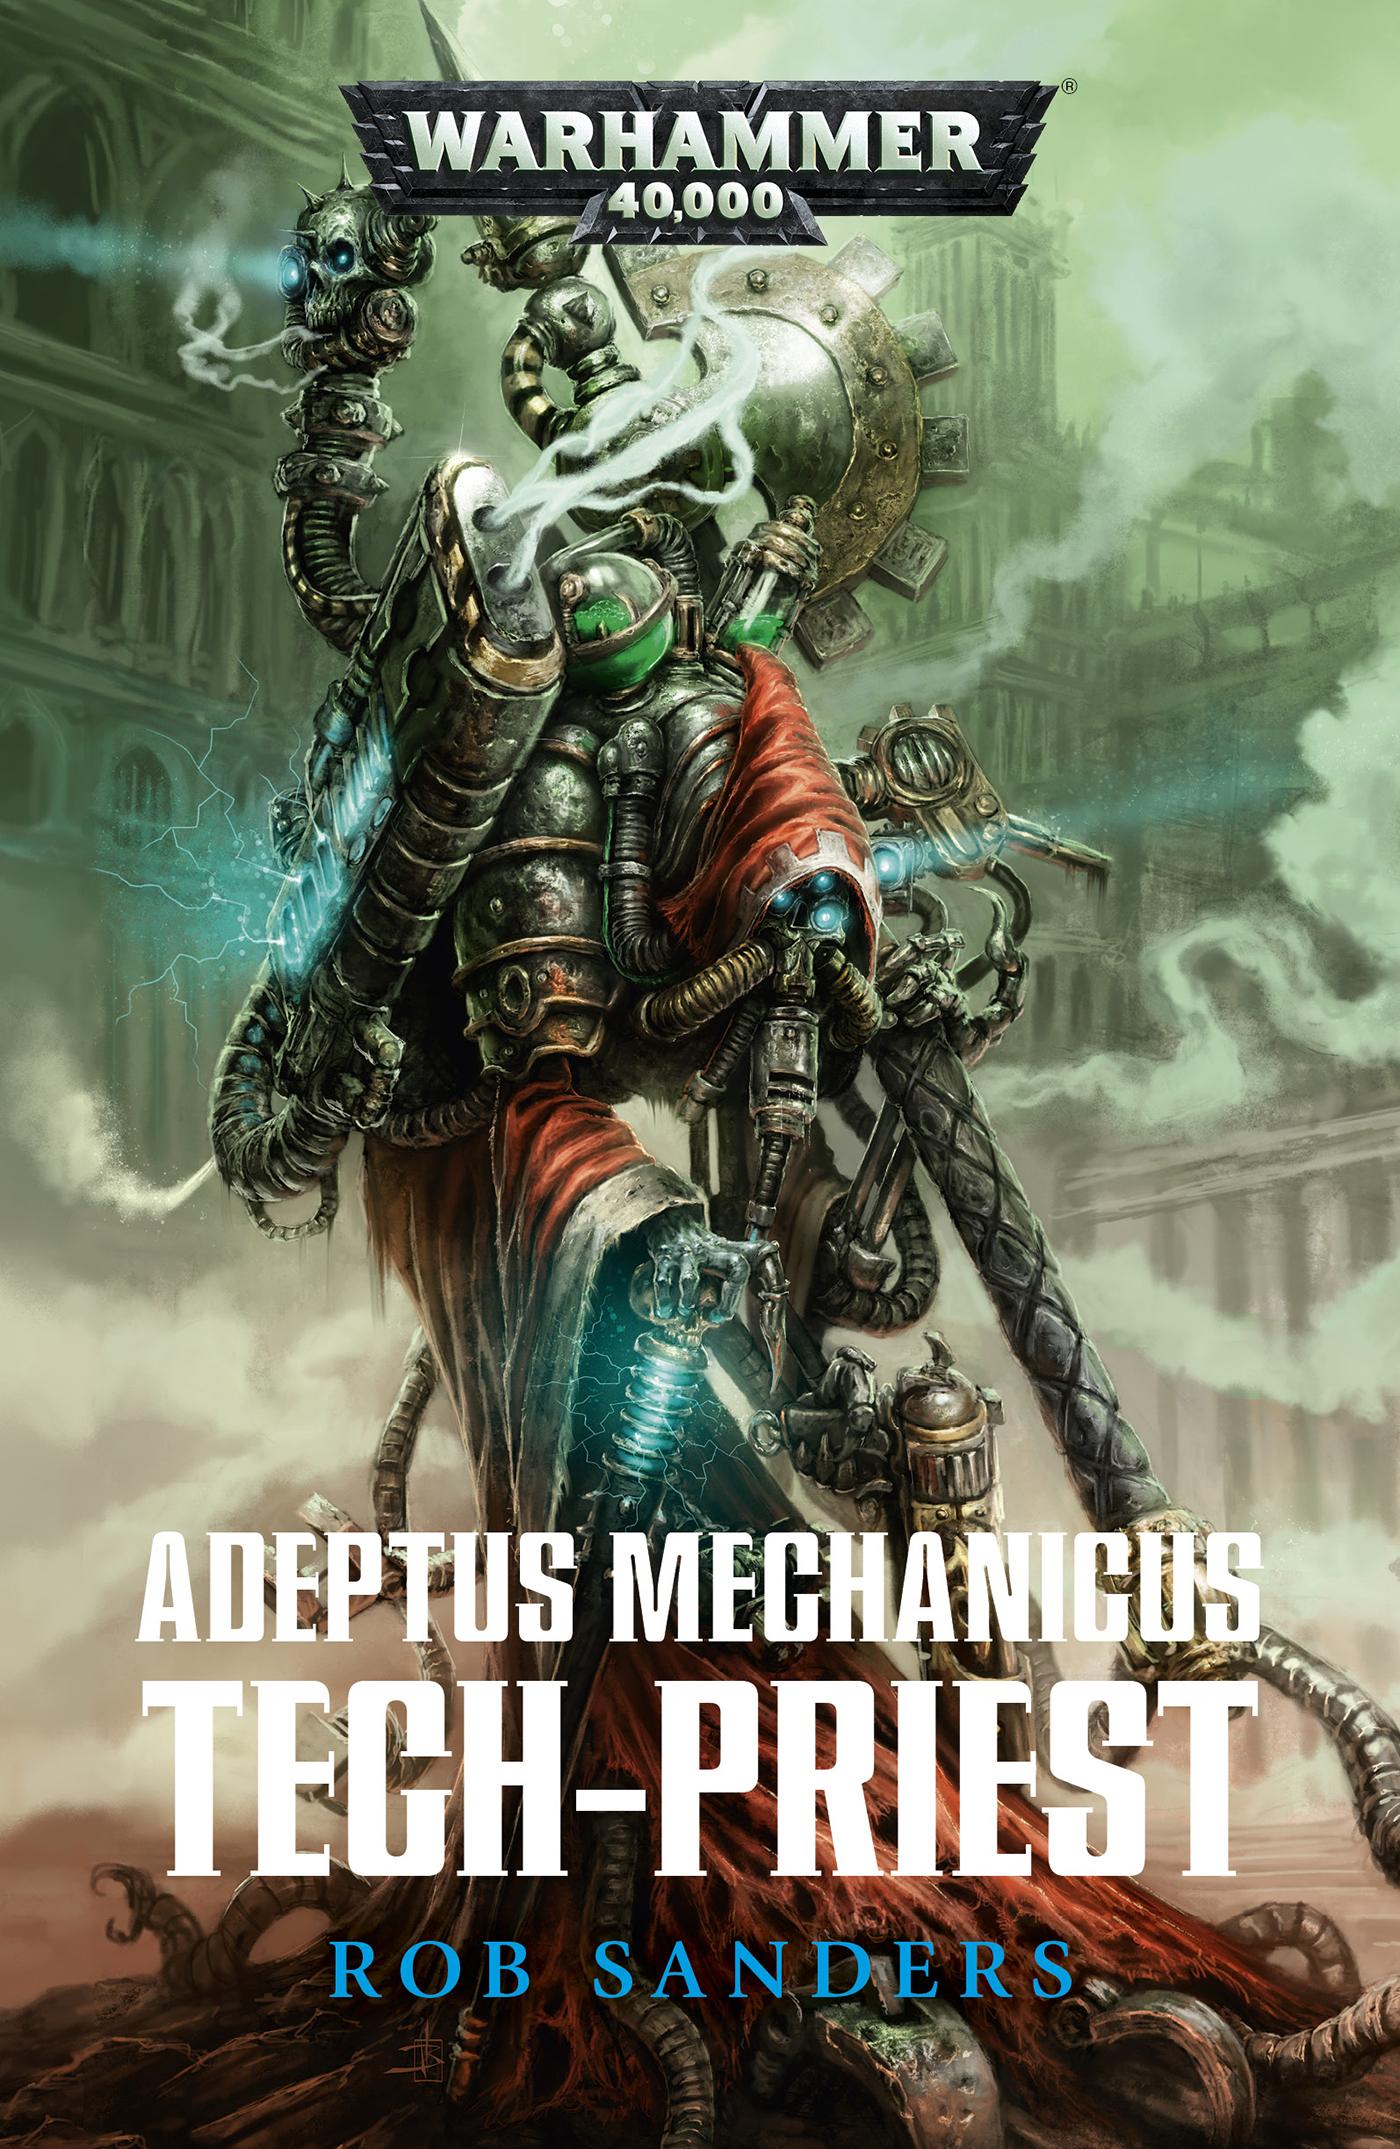 Adeptus Mechanicus: Tech-Priest by Rob Sanders